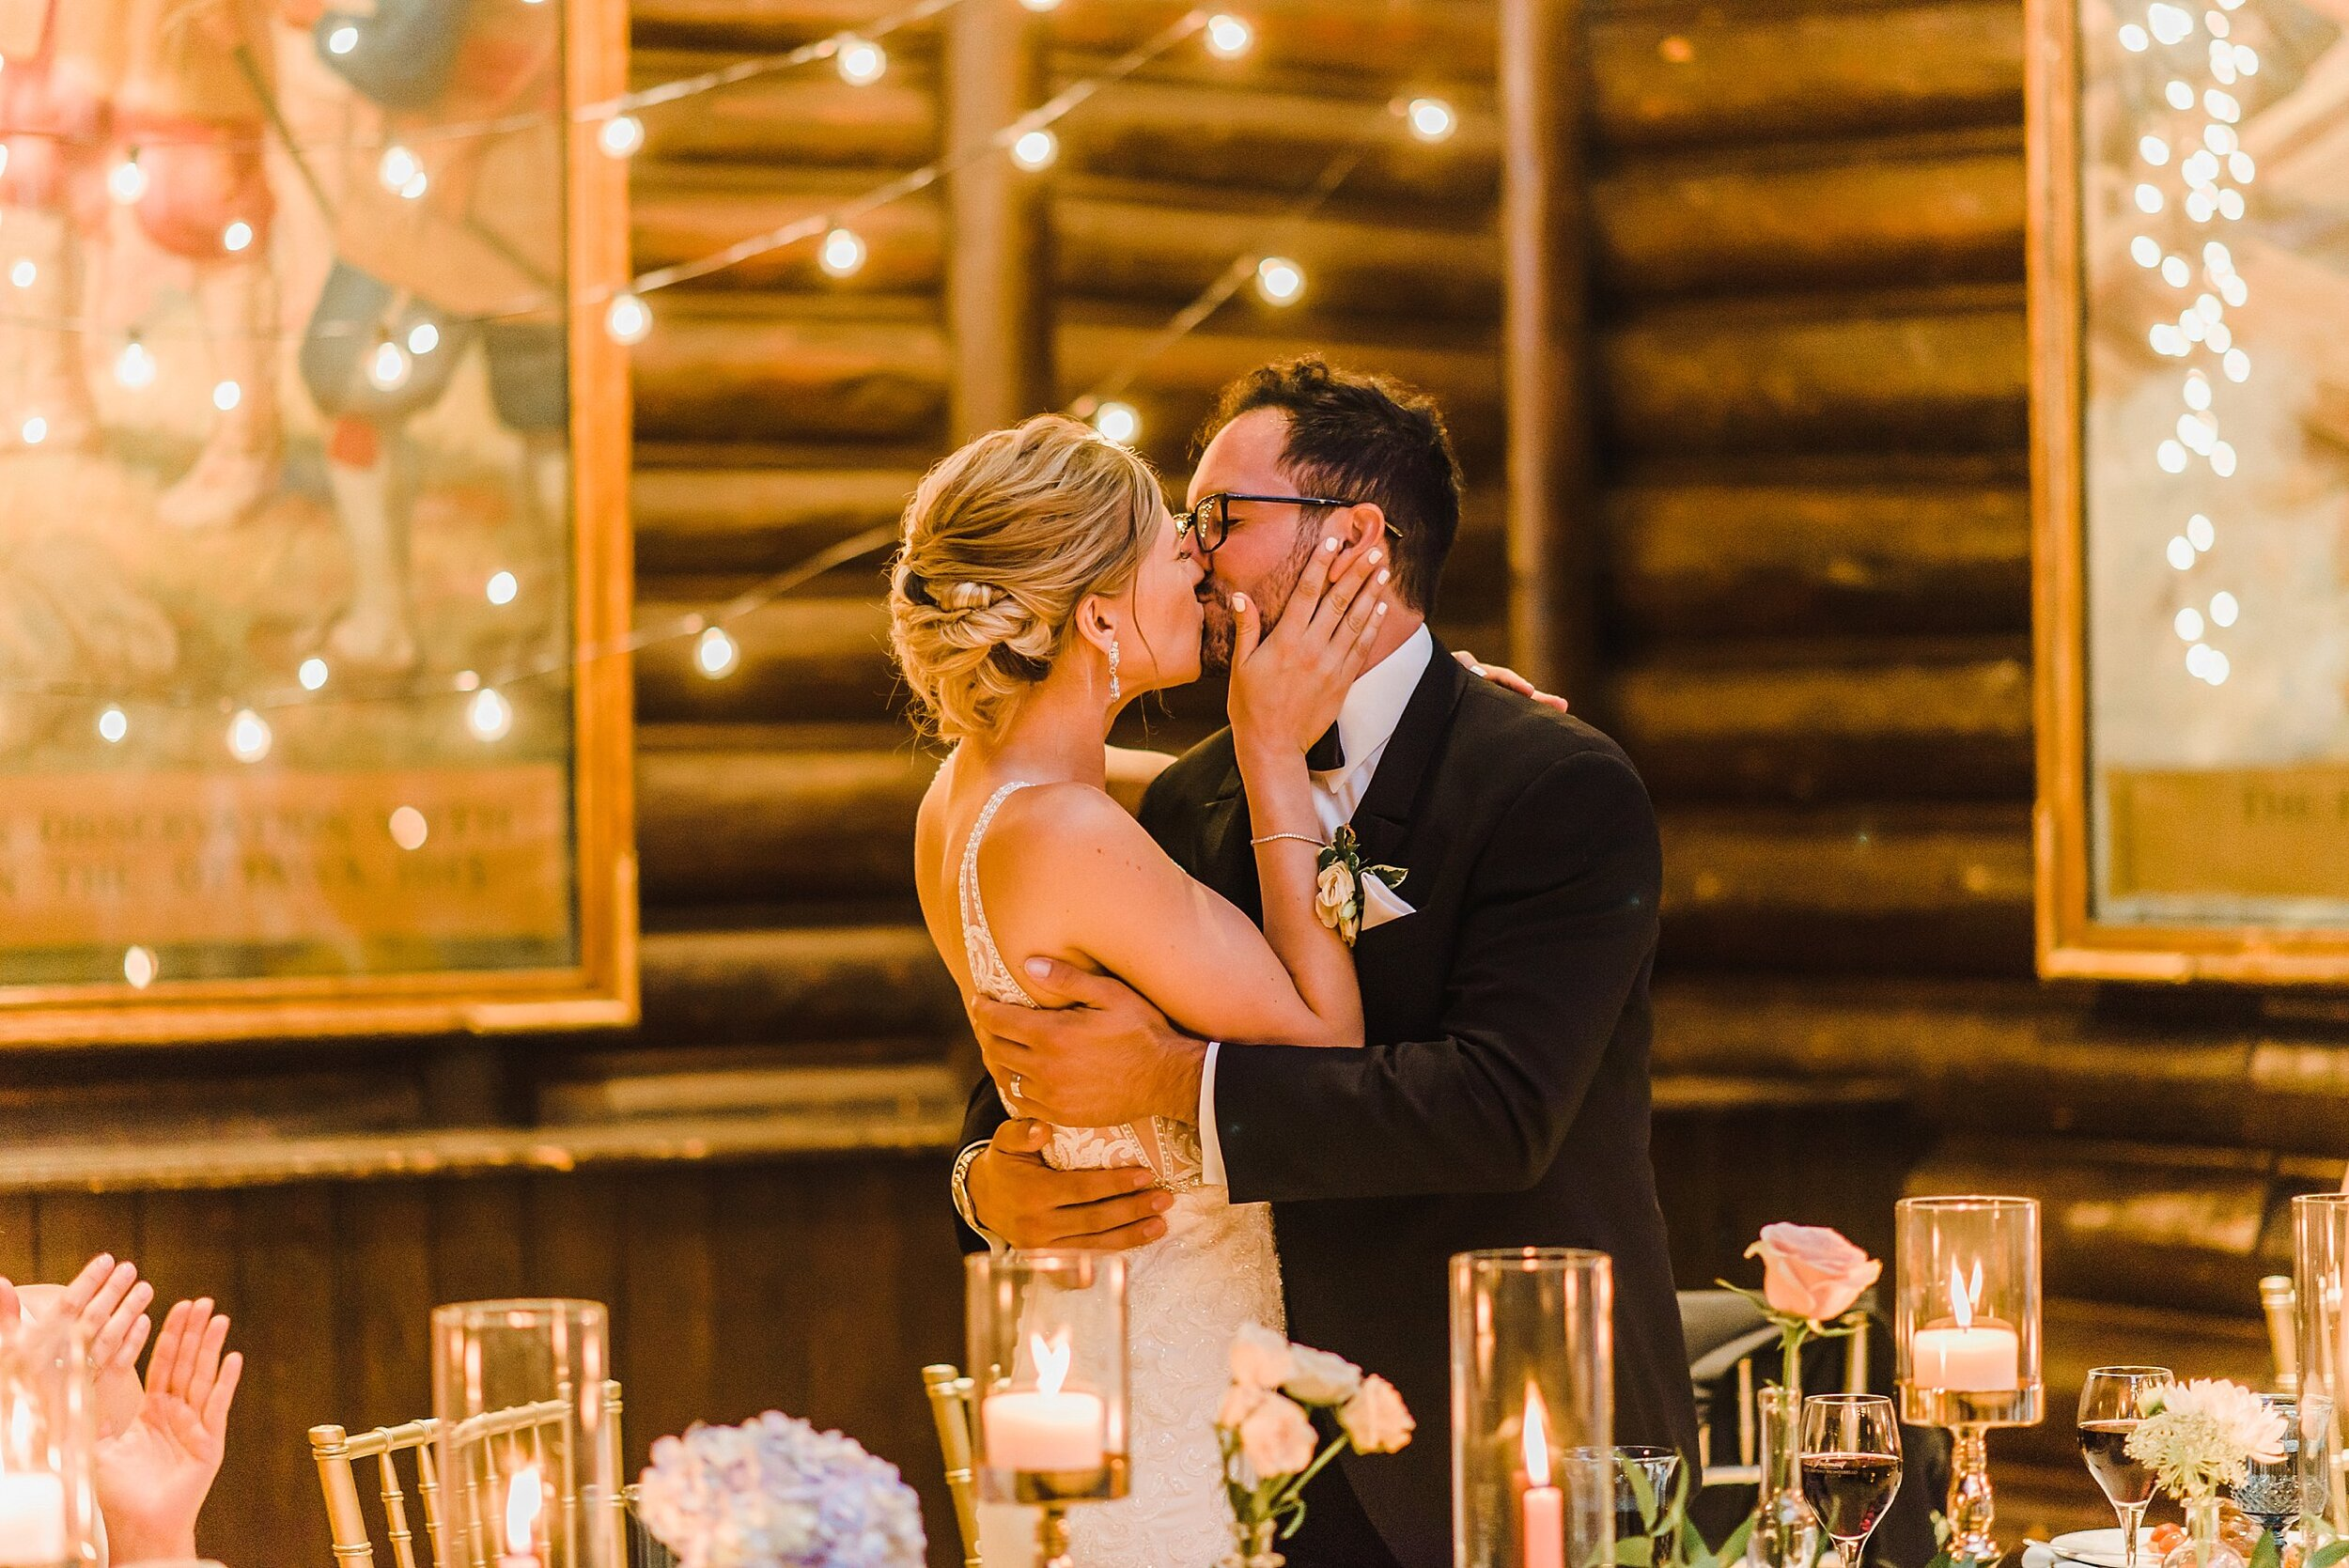 light airy fine art ottawa wedding photographer | Ali and Batoul Photography | Fairmont Le Chateau Montebello101.jpg